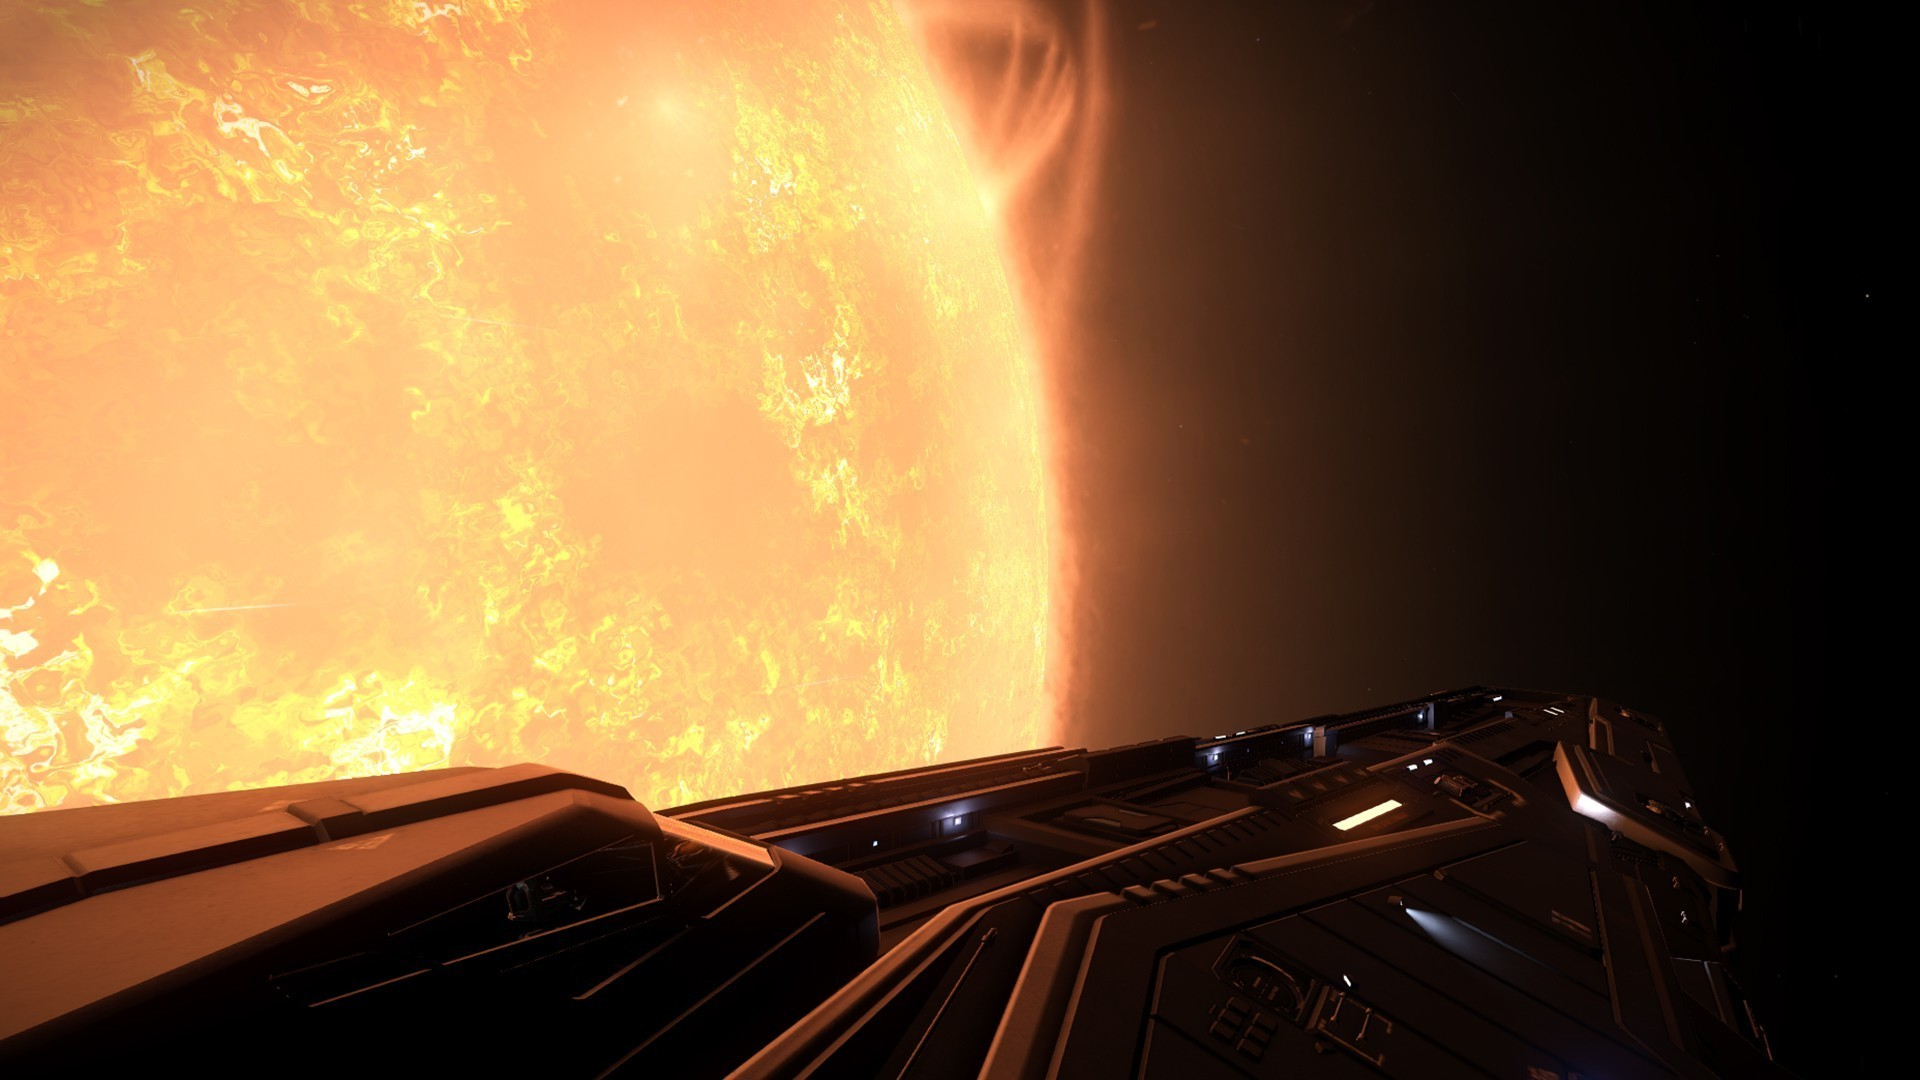 Elite: Dangerous, Science Fiction, Space, Sun, Video Games Wallpapers HD /  Desktop and Mobile Backgrounds